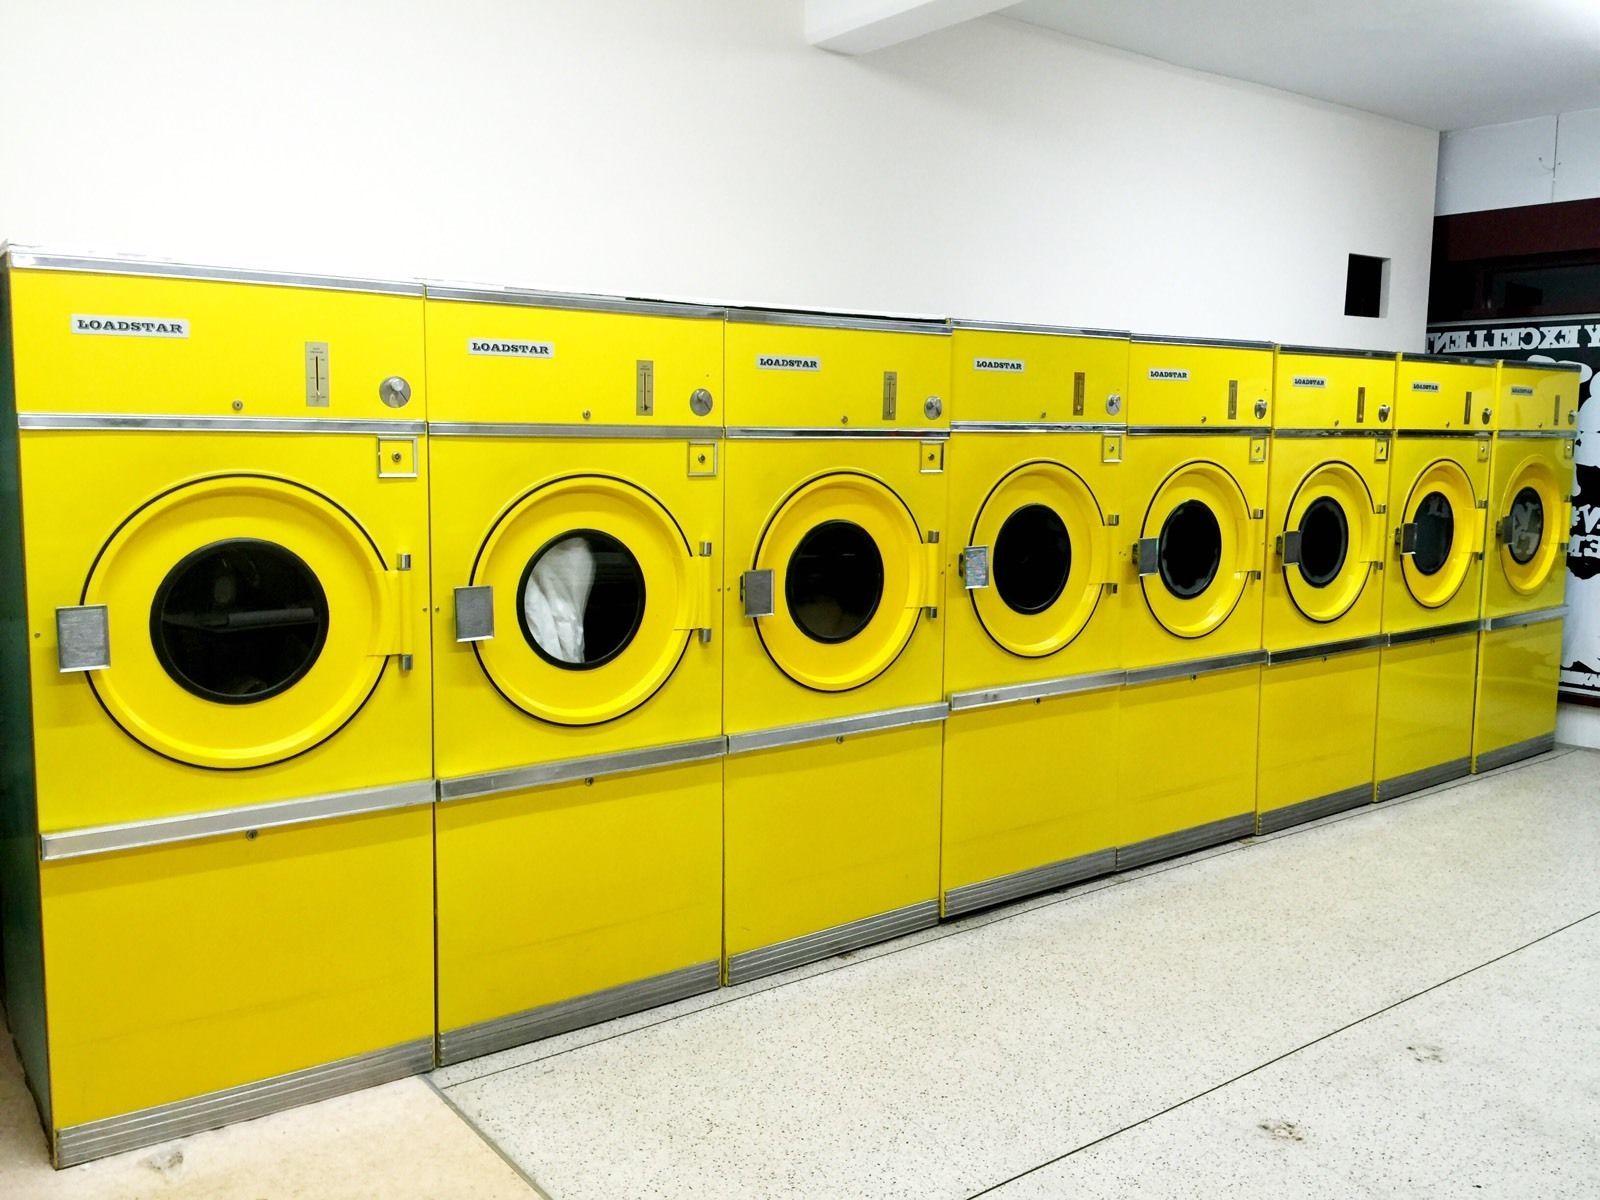 LOAD STAR mercial industrial washing machine DRYER laundry #0: eabe040ce392b3fb5299f528dfbf72e9